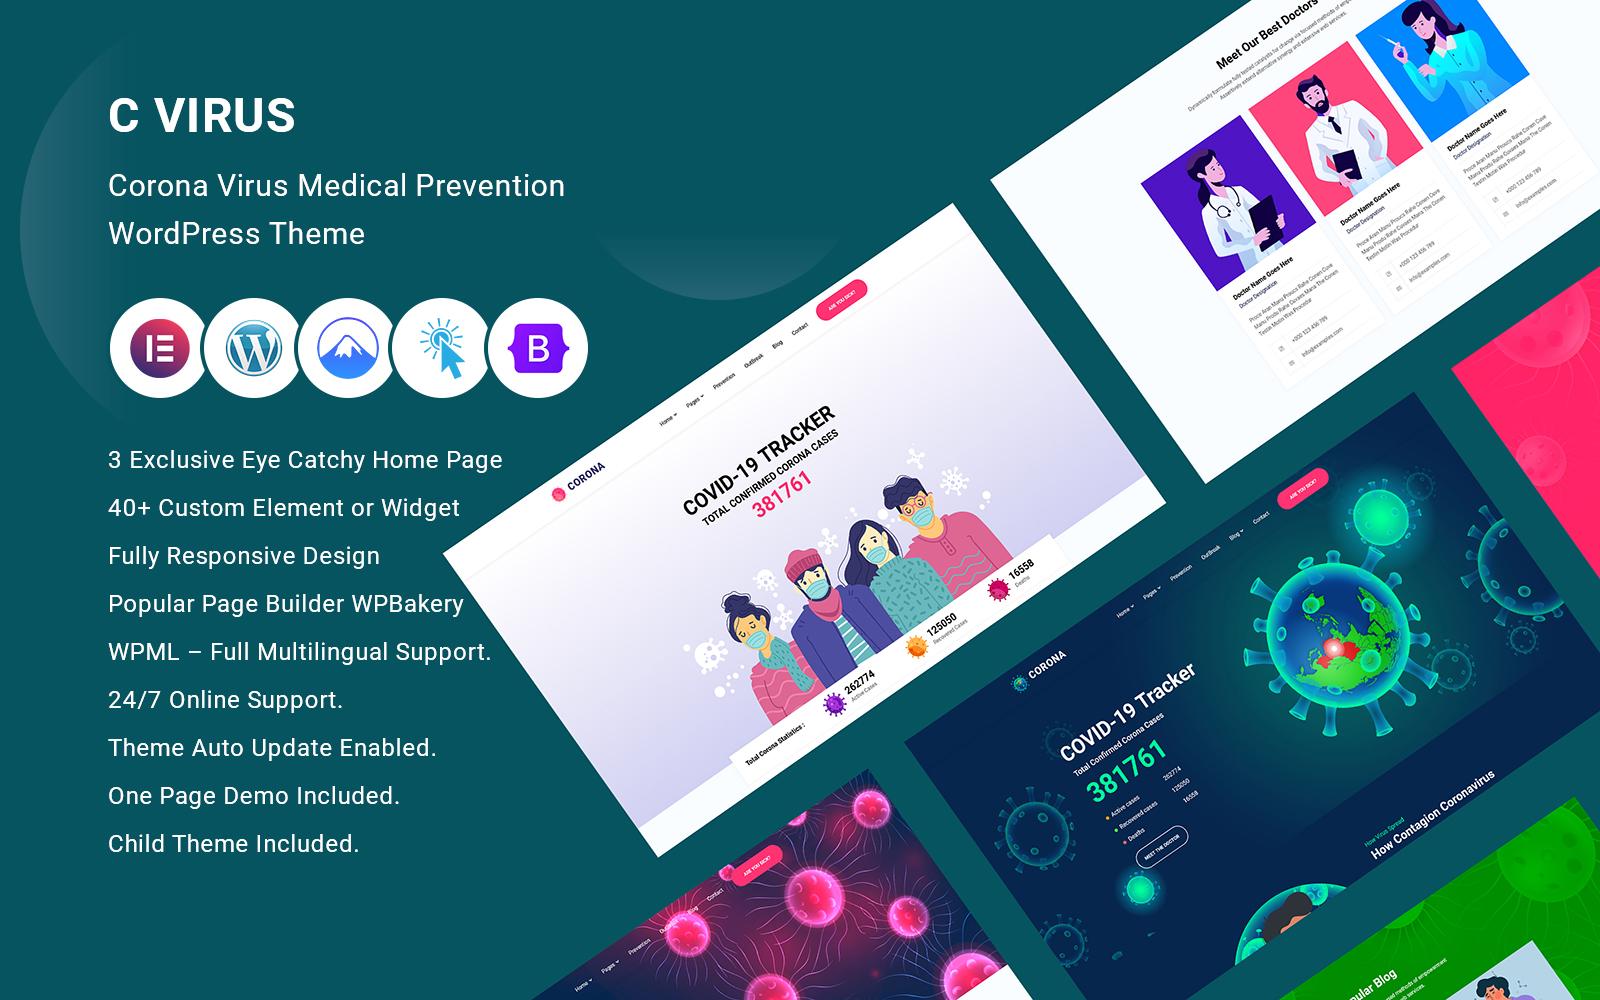 Cvirus - Corona virus Medical Prevention WordPress Theme